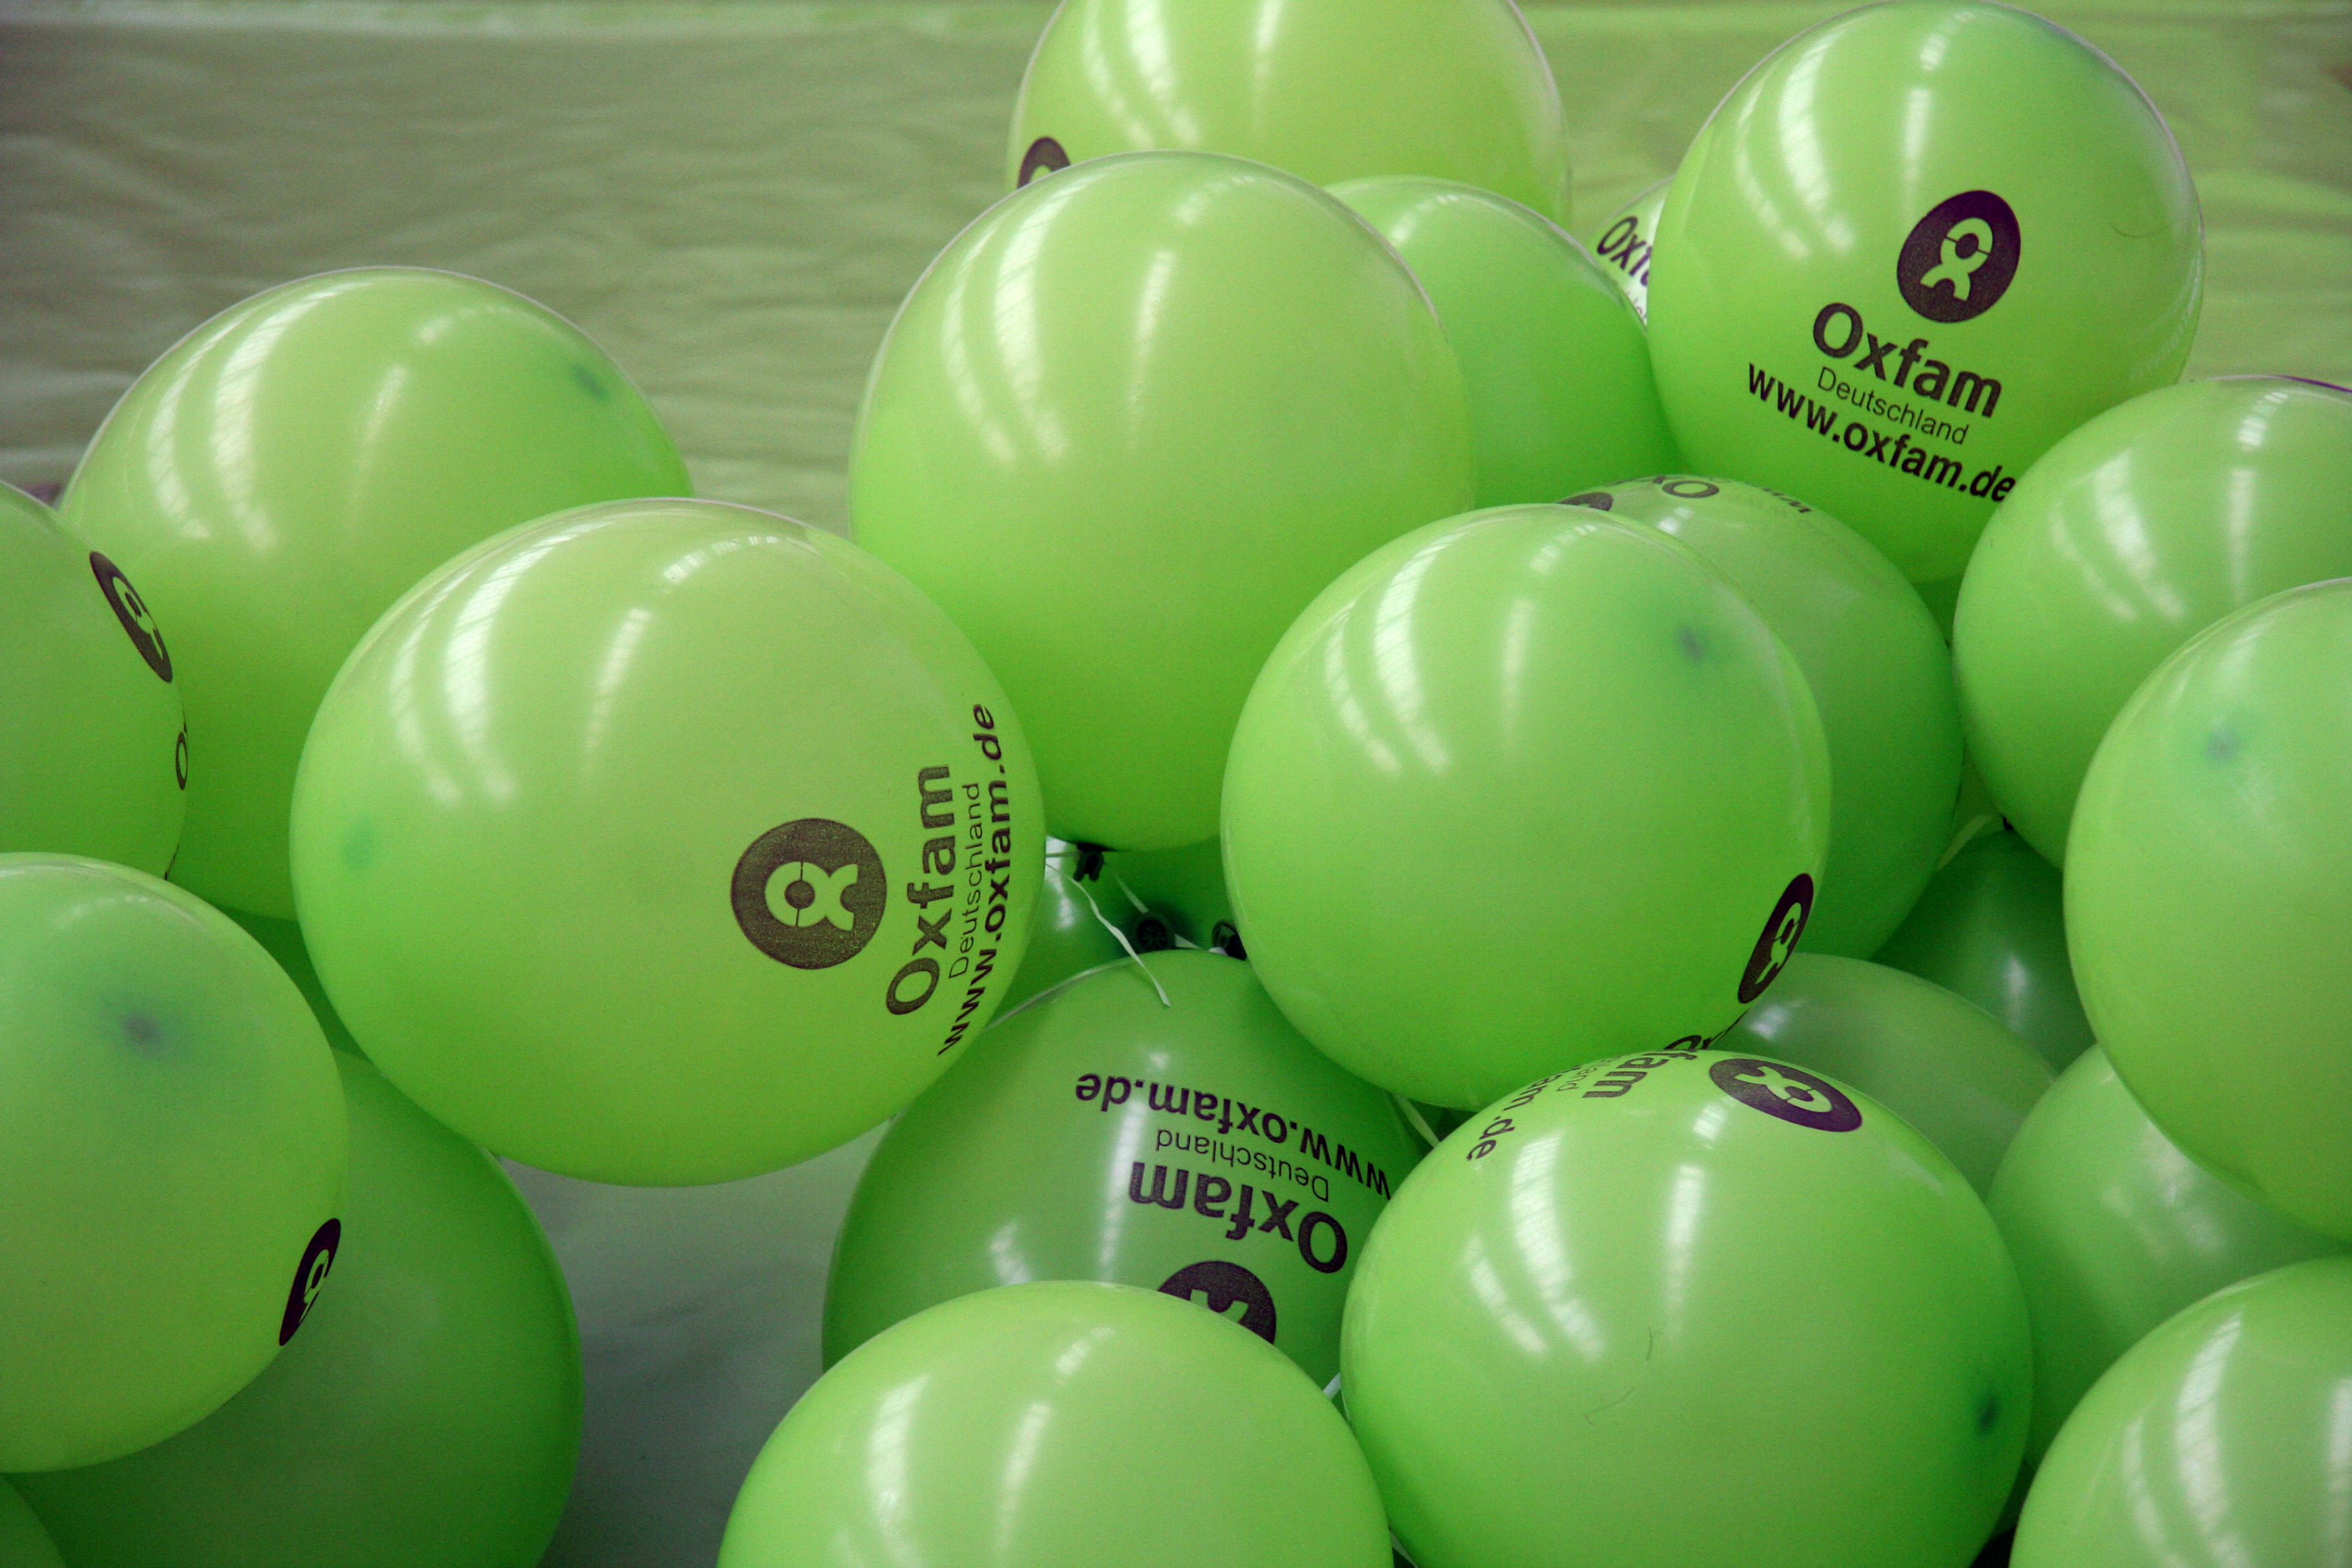 Ballons mit Oxfam-Logo